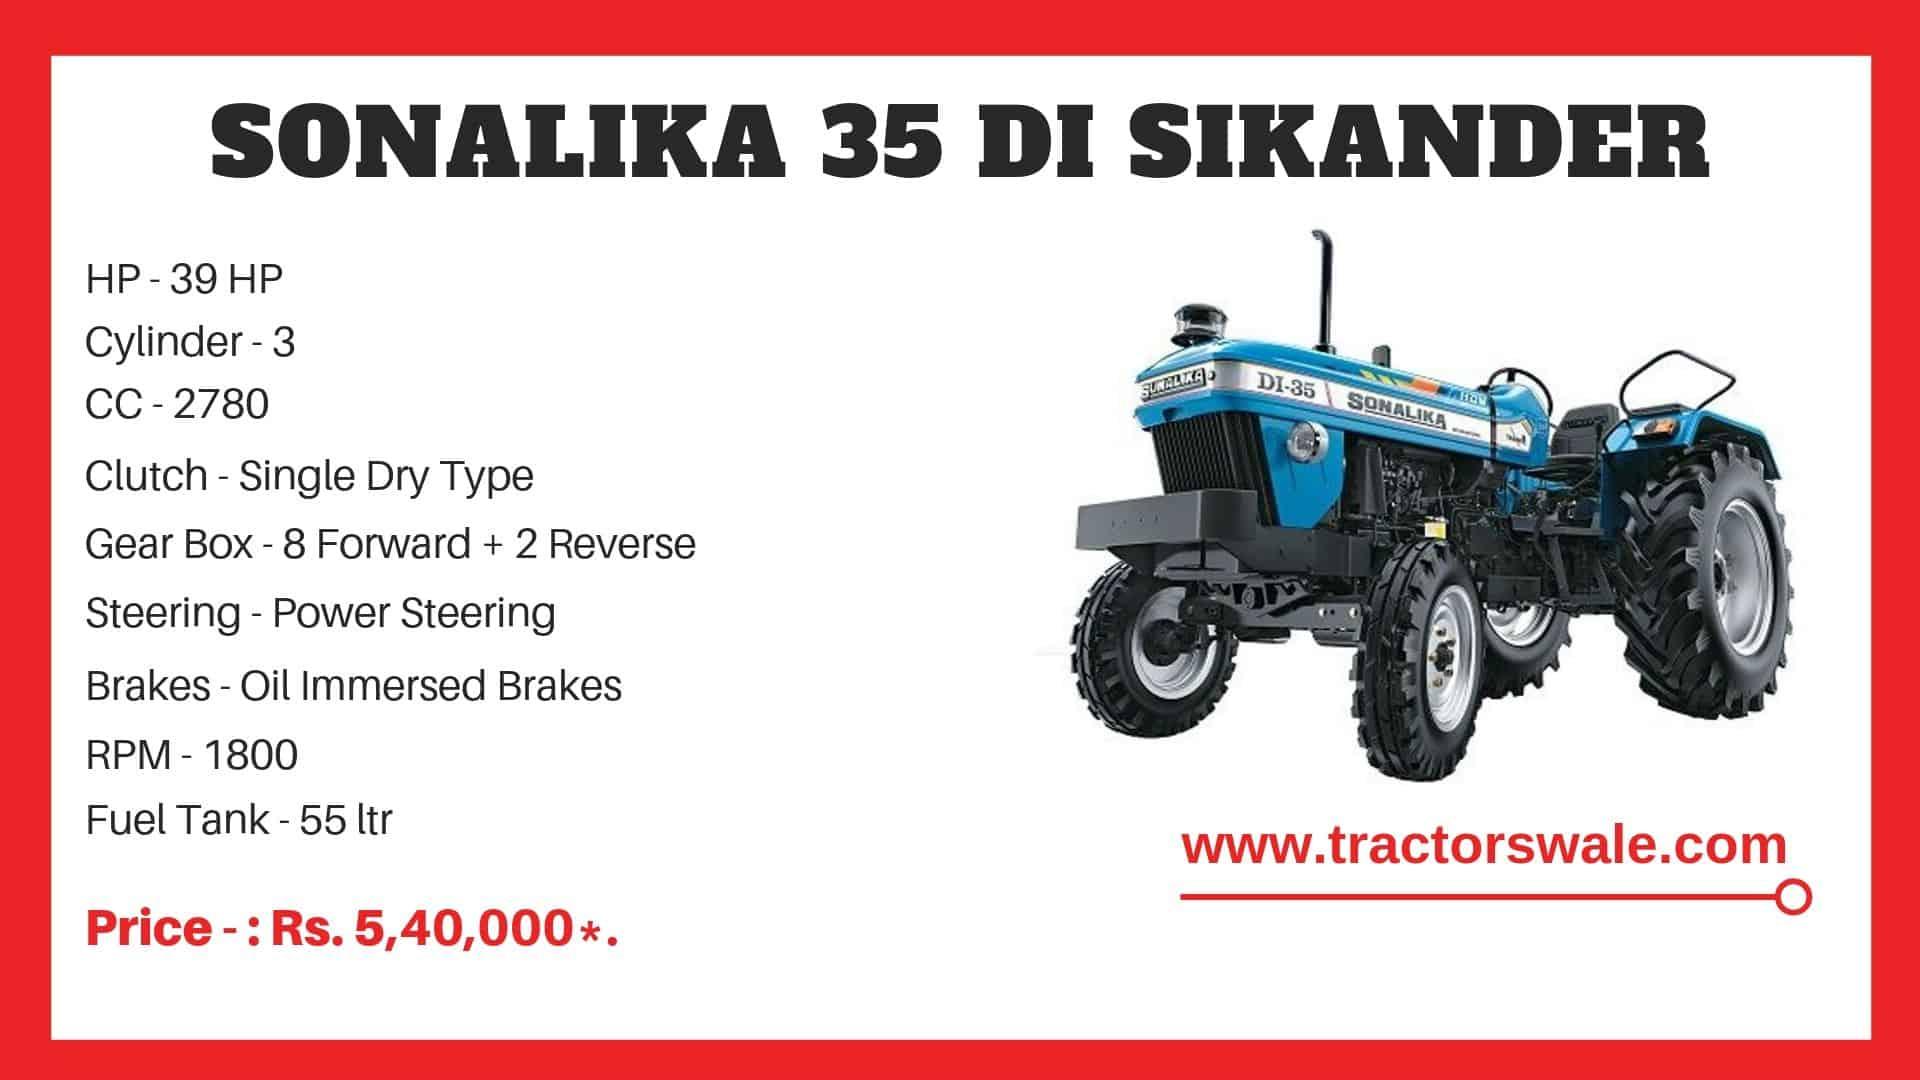 Sonalika 35 DI Sikander Tractor specs